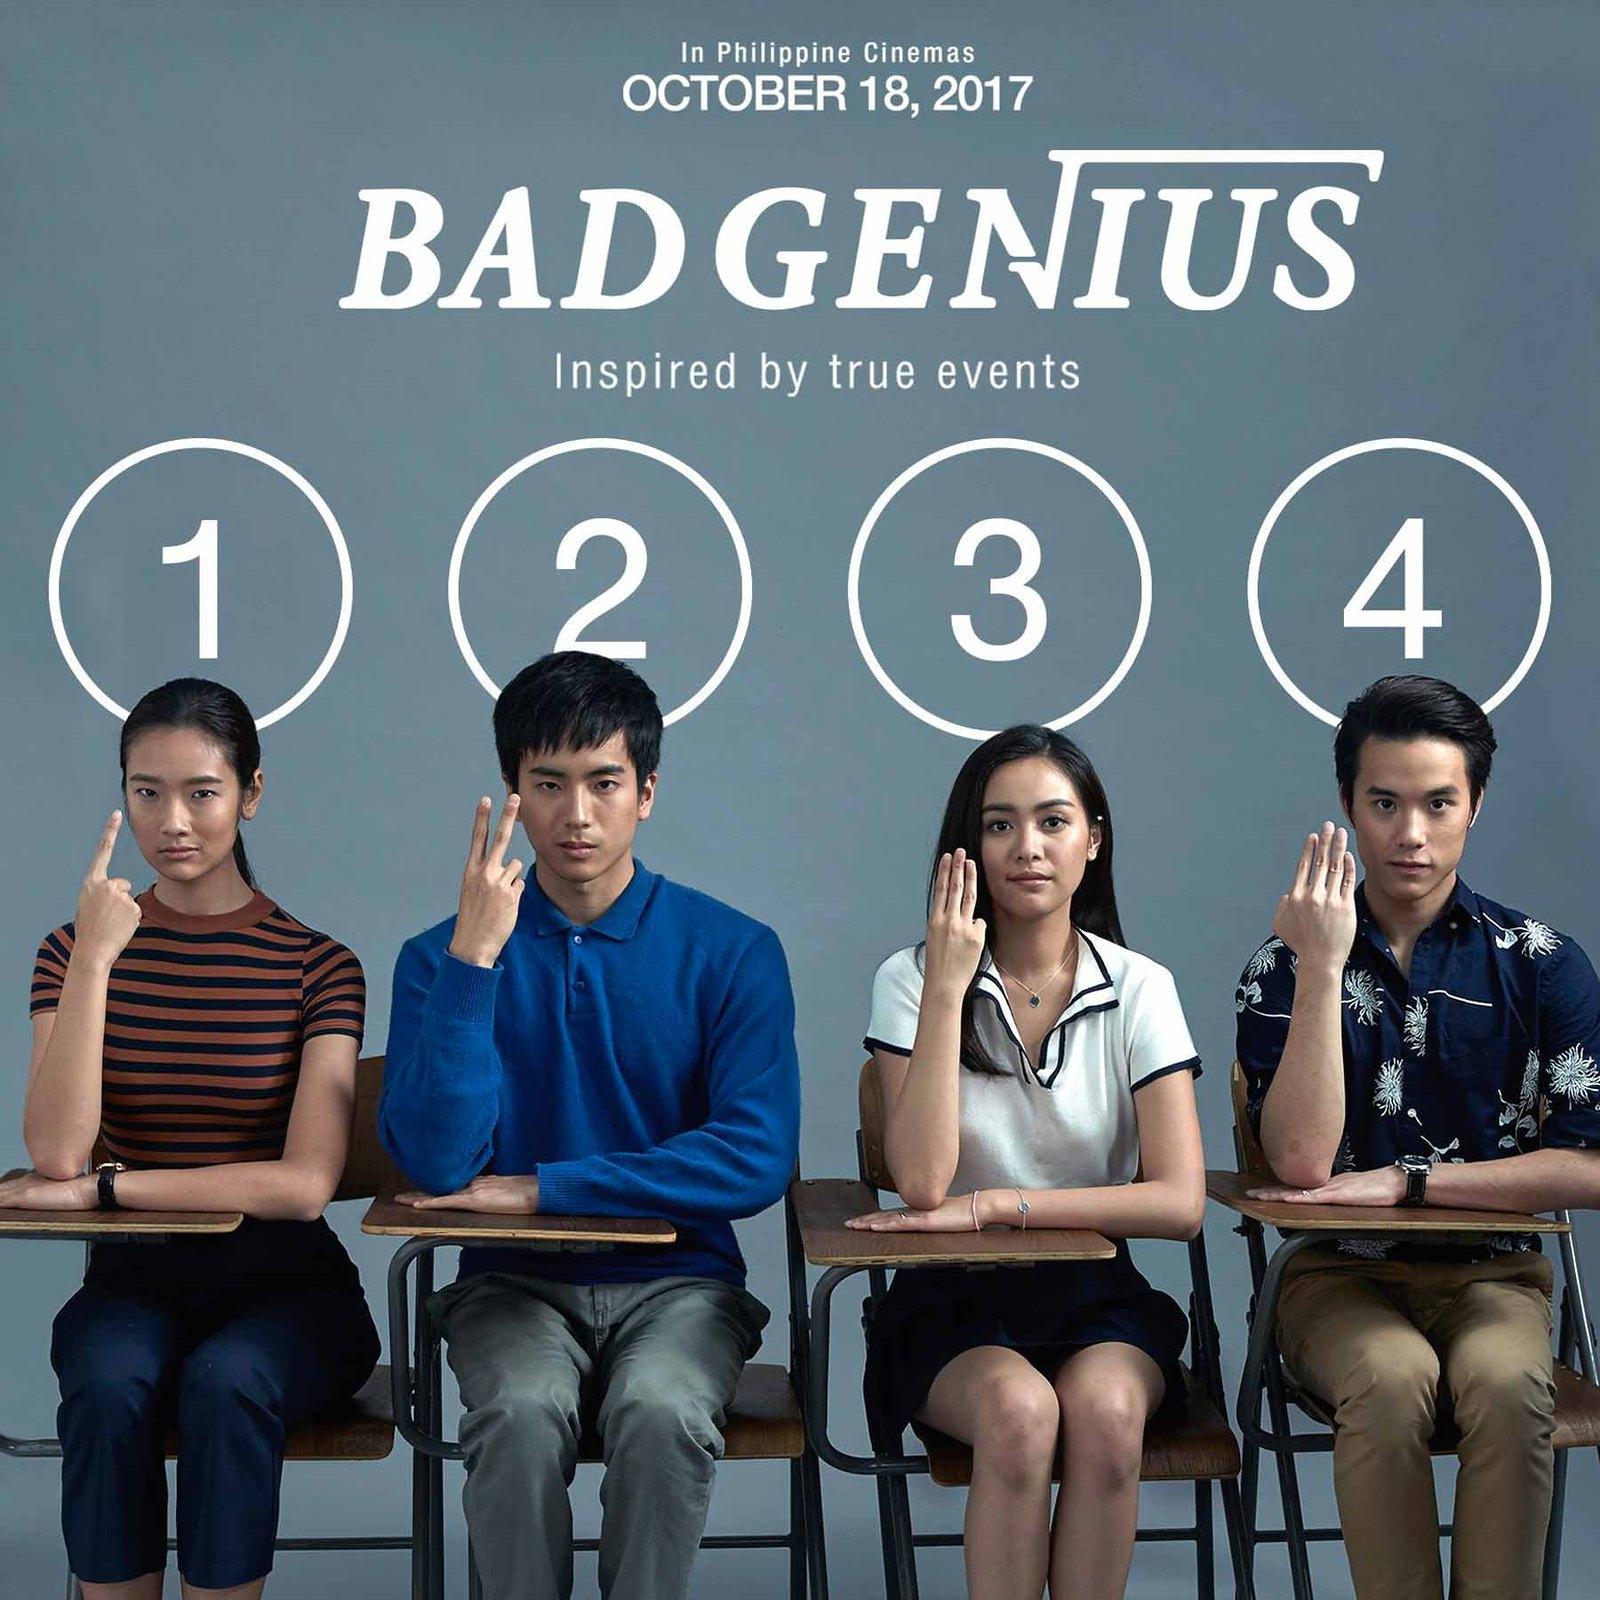 bad genius actors